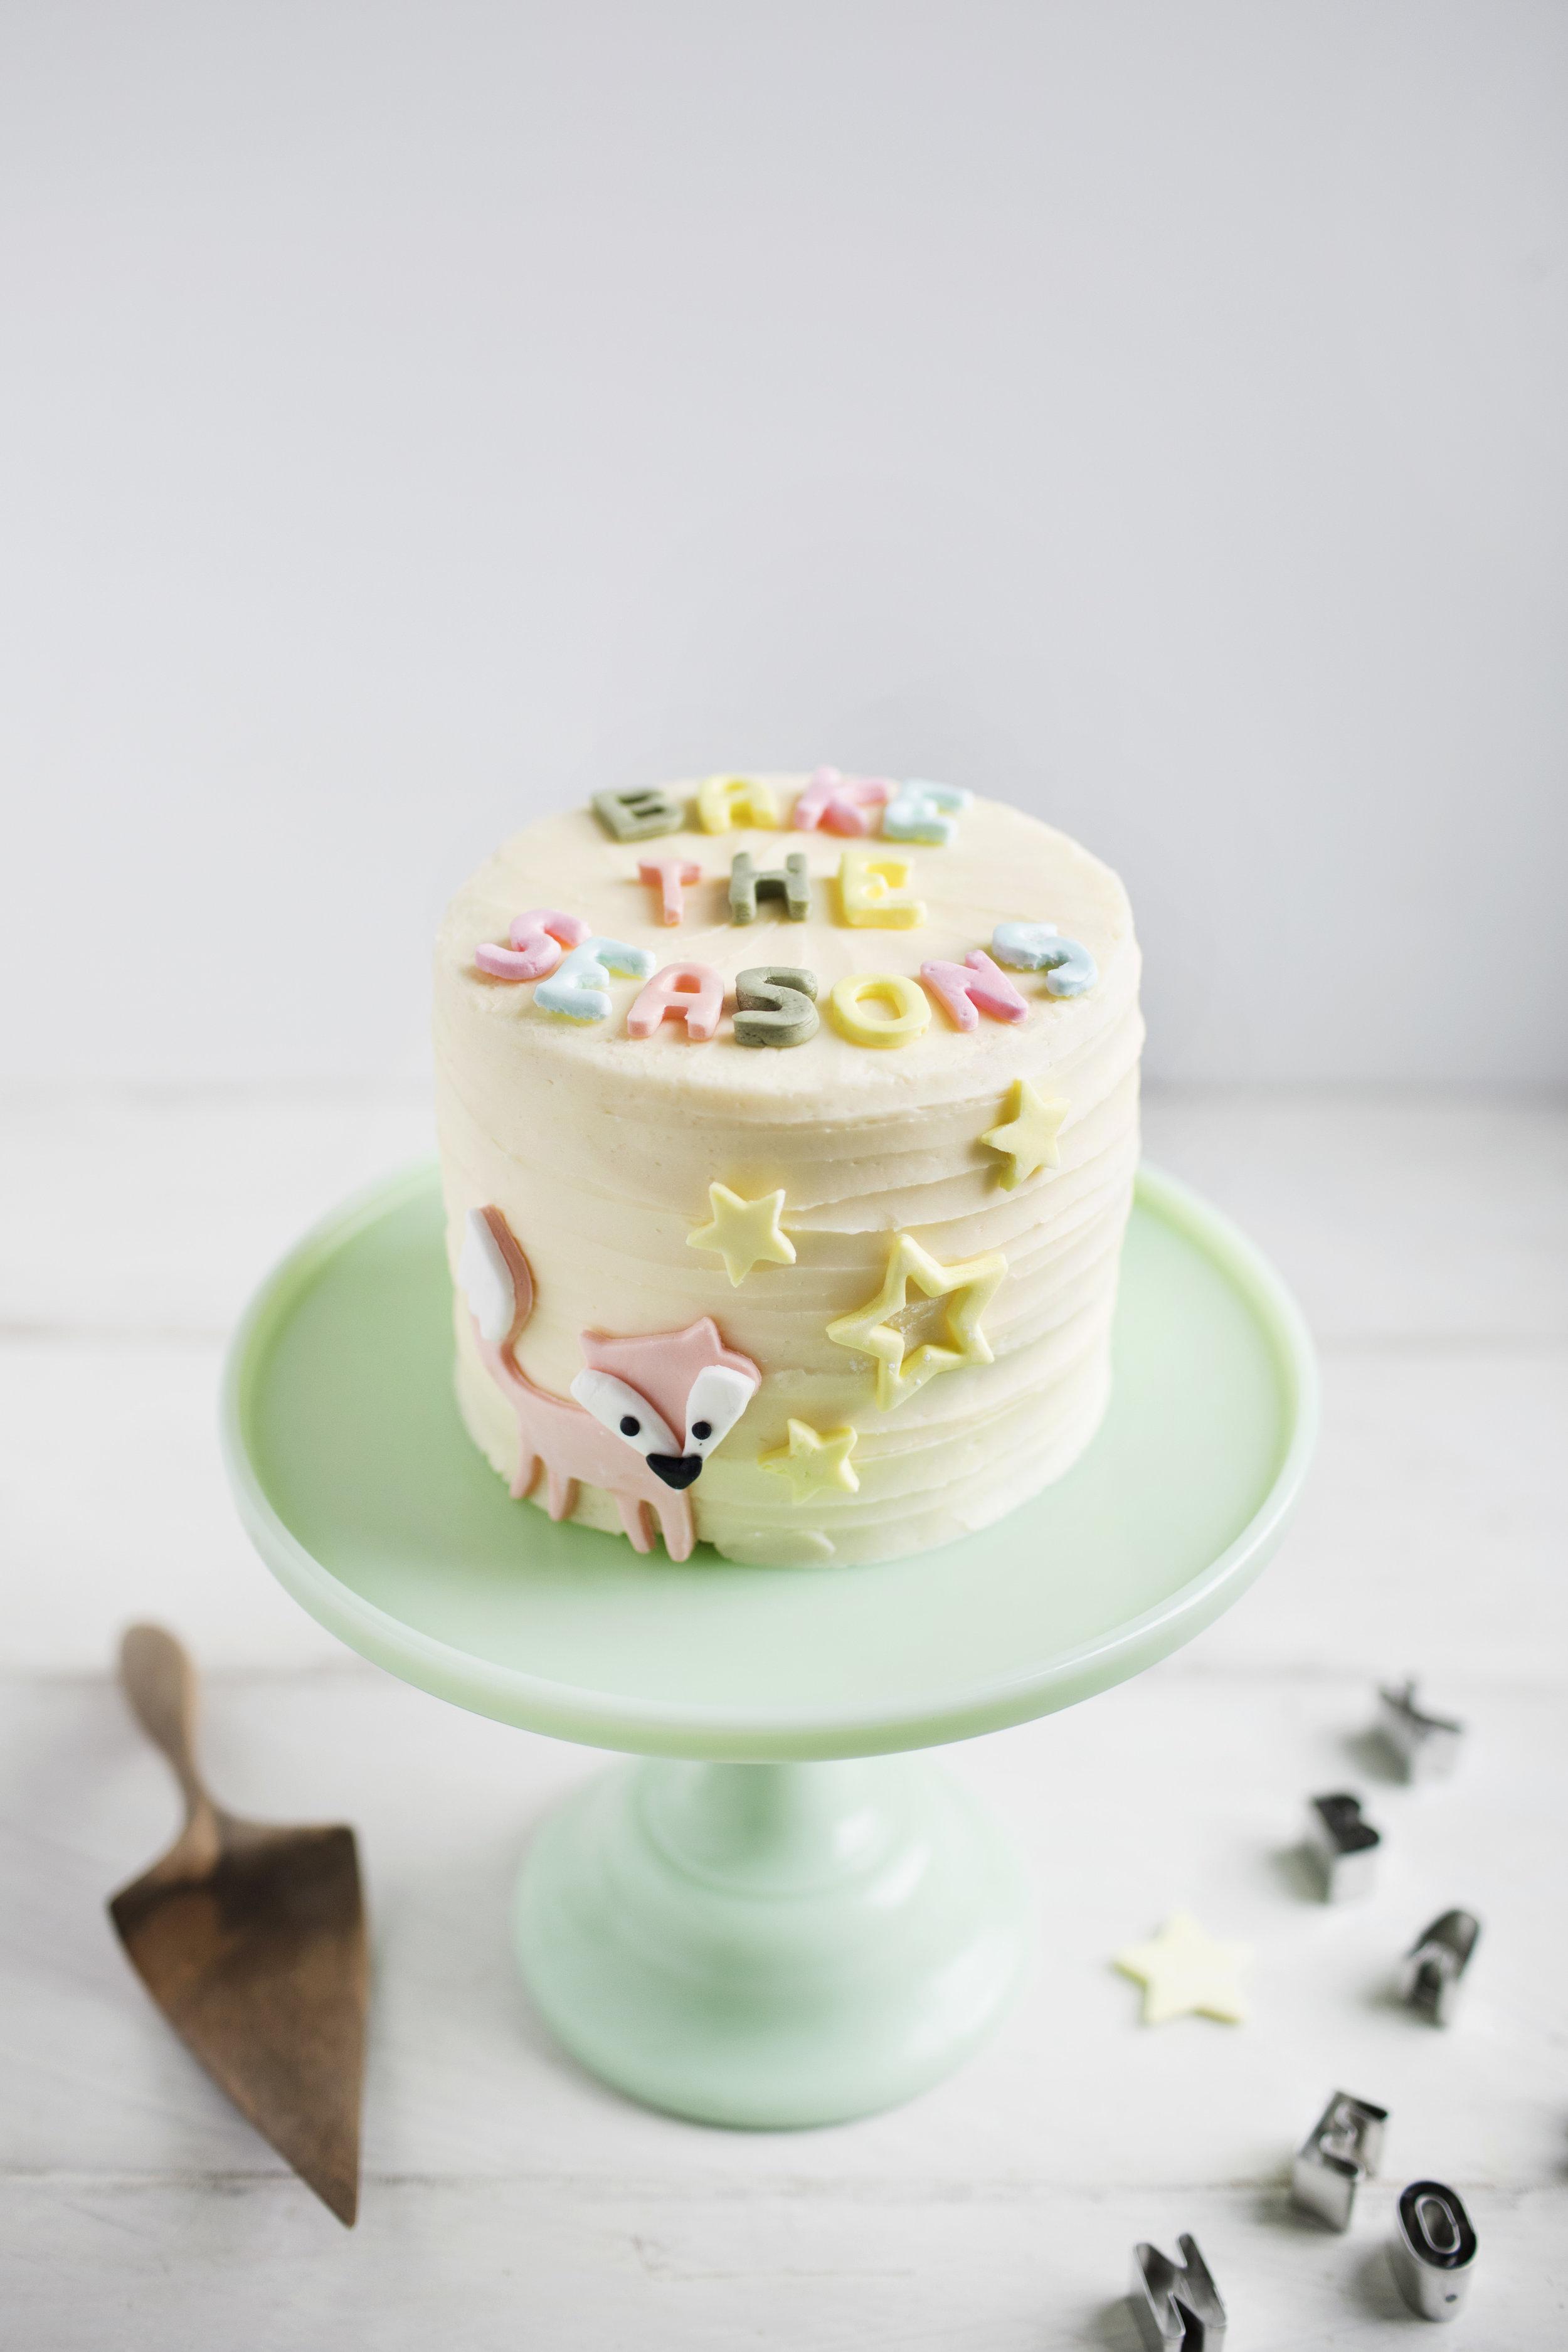 bake the seasons cake iii.jpg